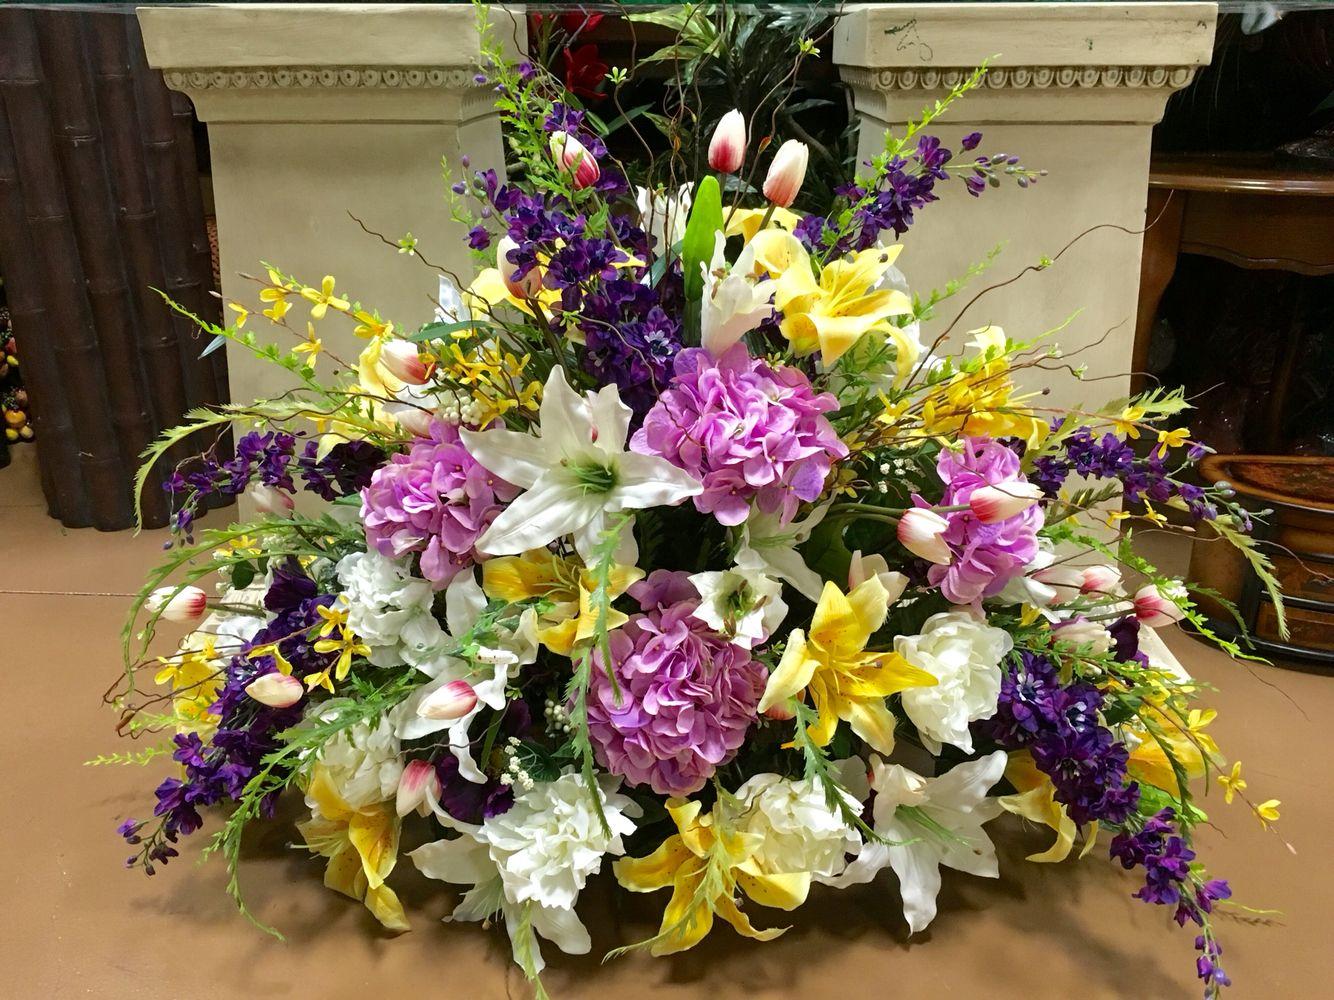 Pin by TESSA on FLORAL BOUQUETS | Pinterest |Large Spring Floral Arrangements